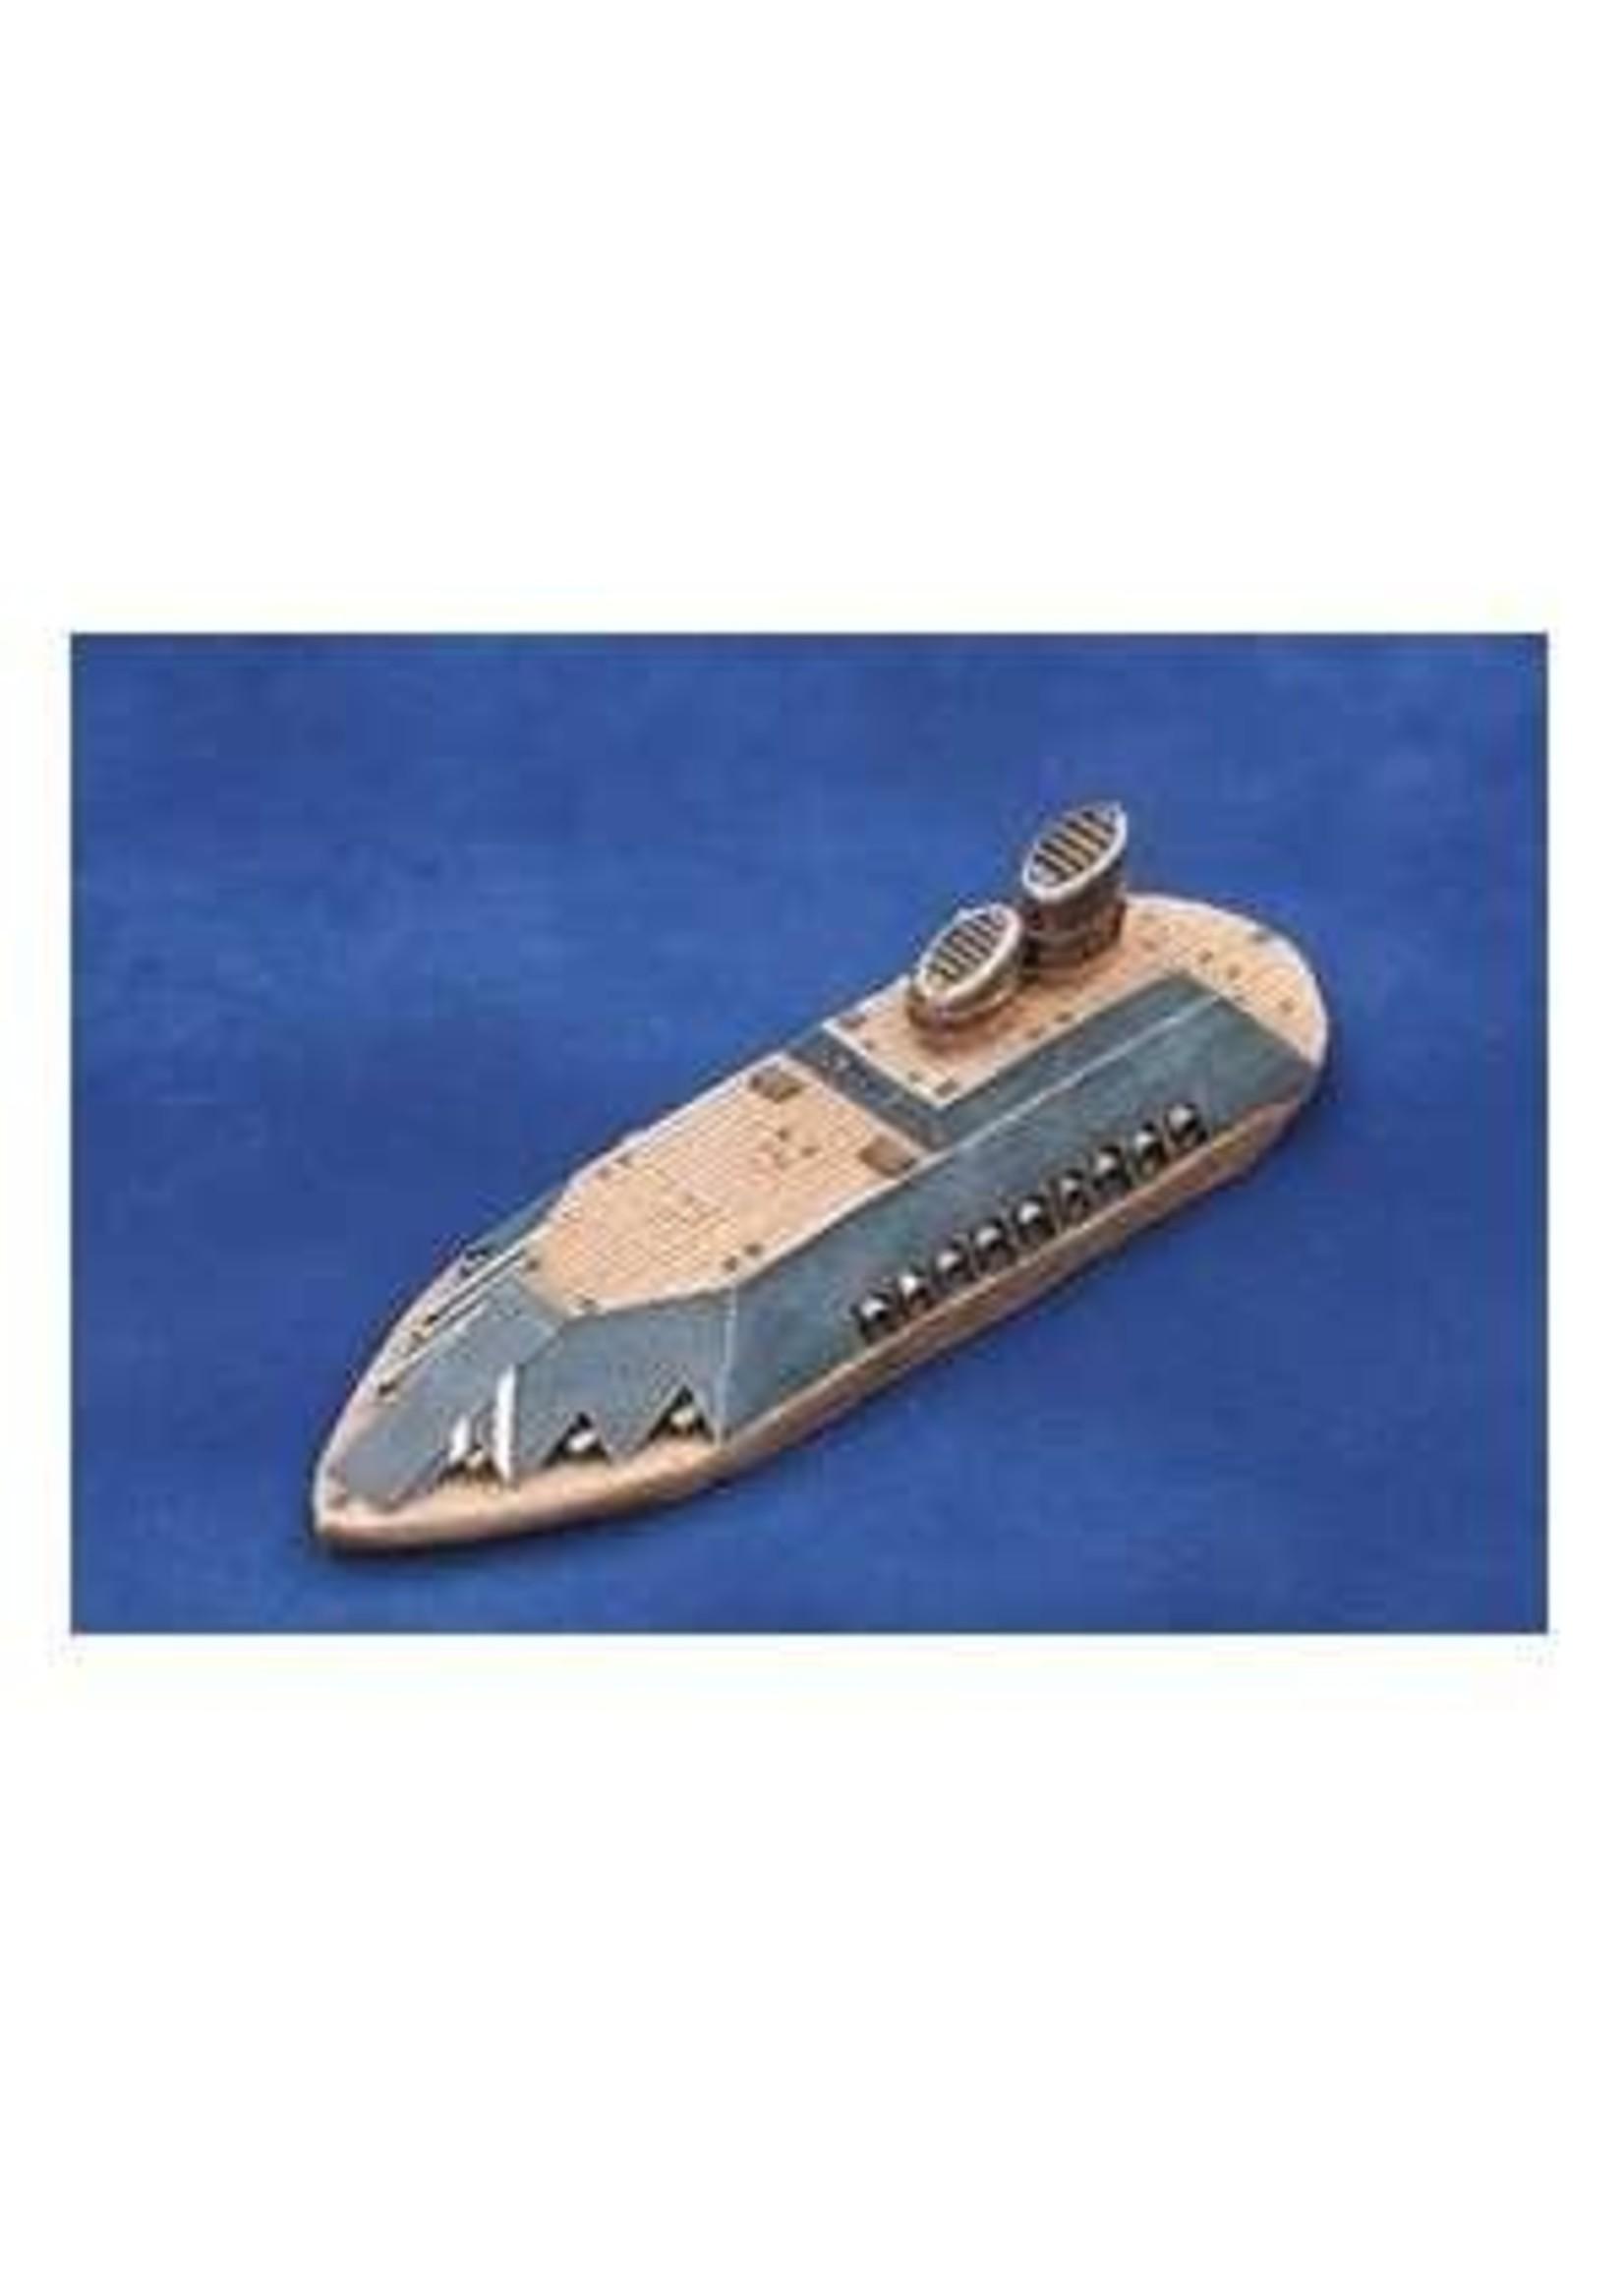 Uncharted Seas: Iron Dwarves Battleship (1)